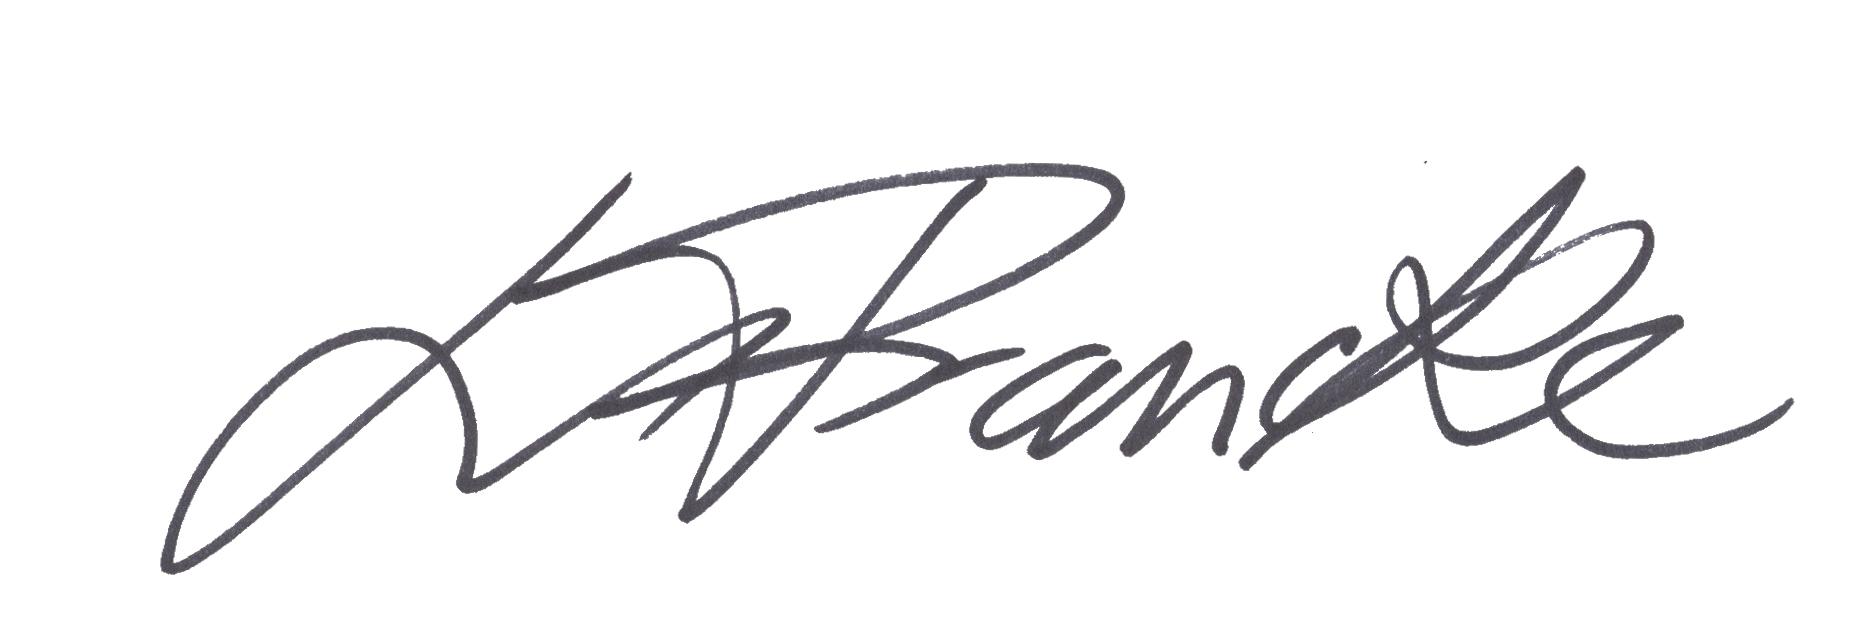 Louise Francke's Signature